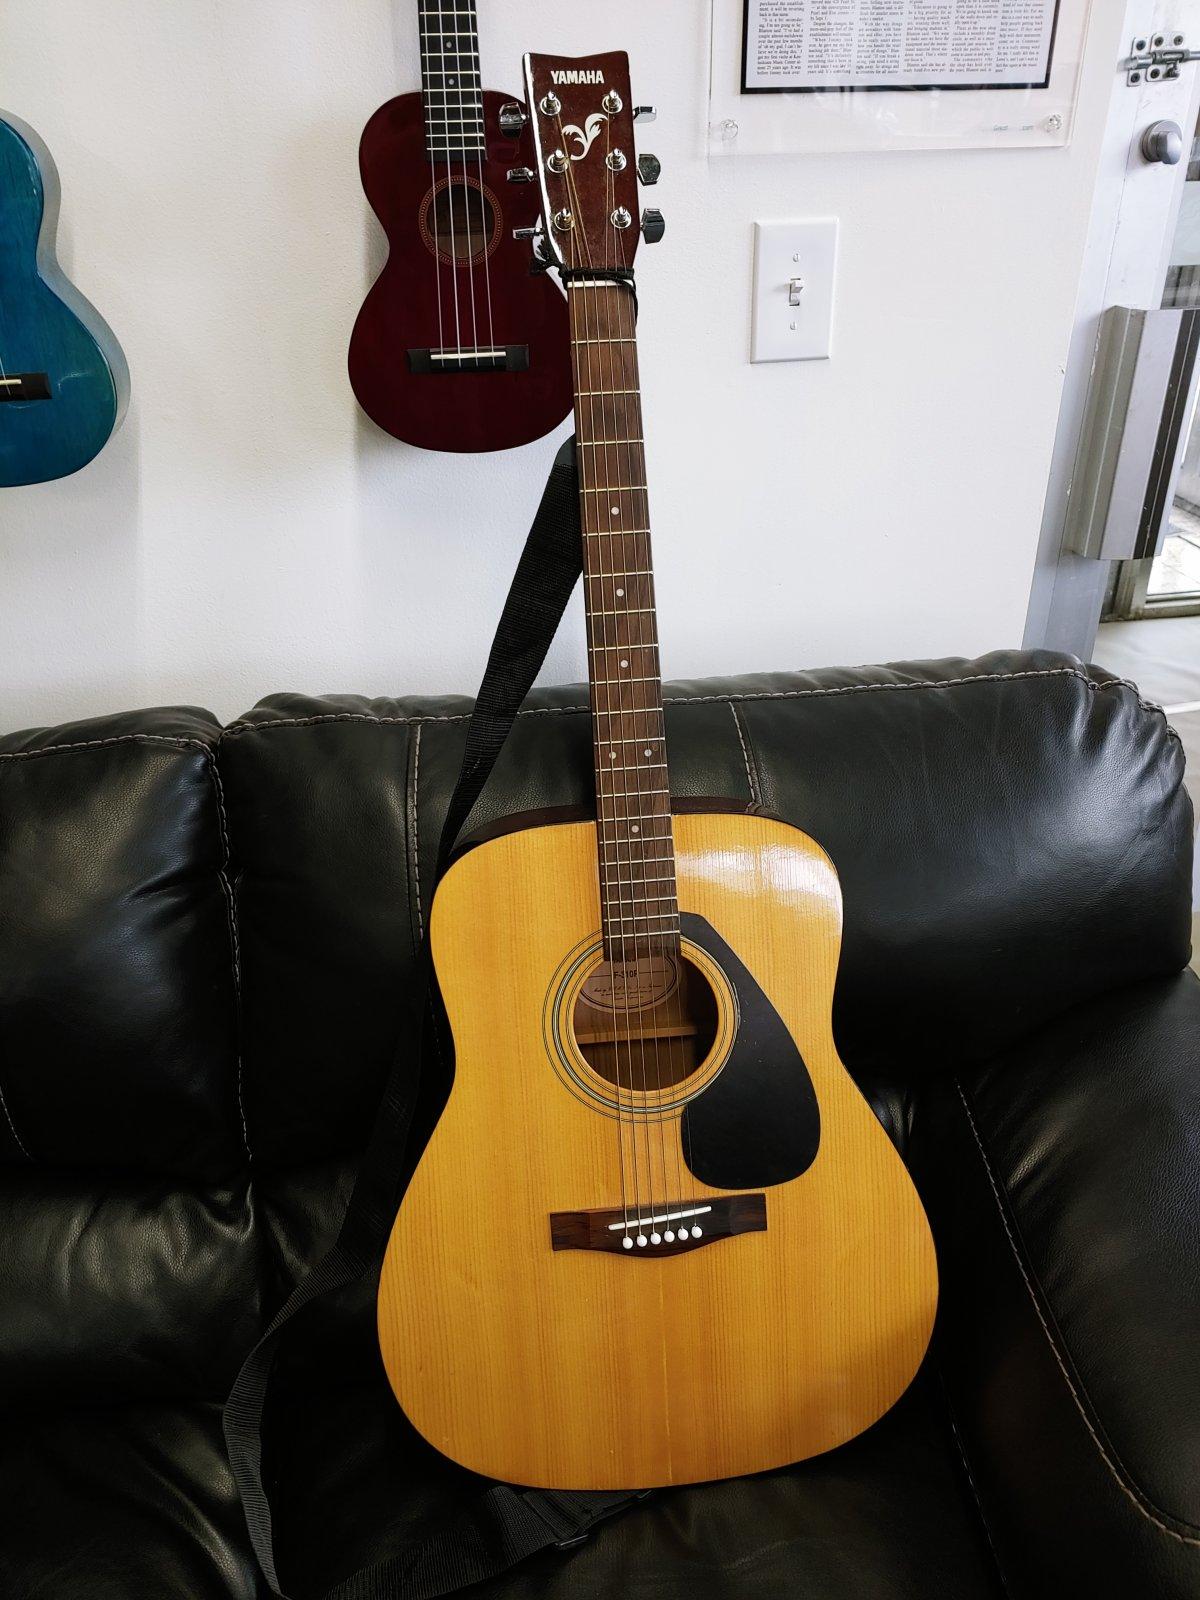 Yamaha F-310P Acoustic Guitar (used)